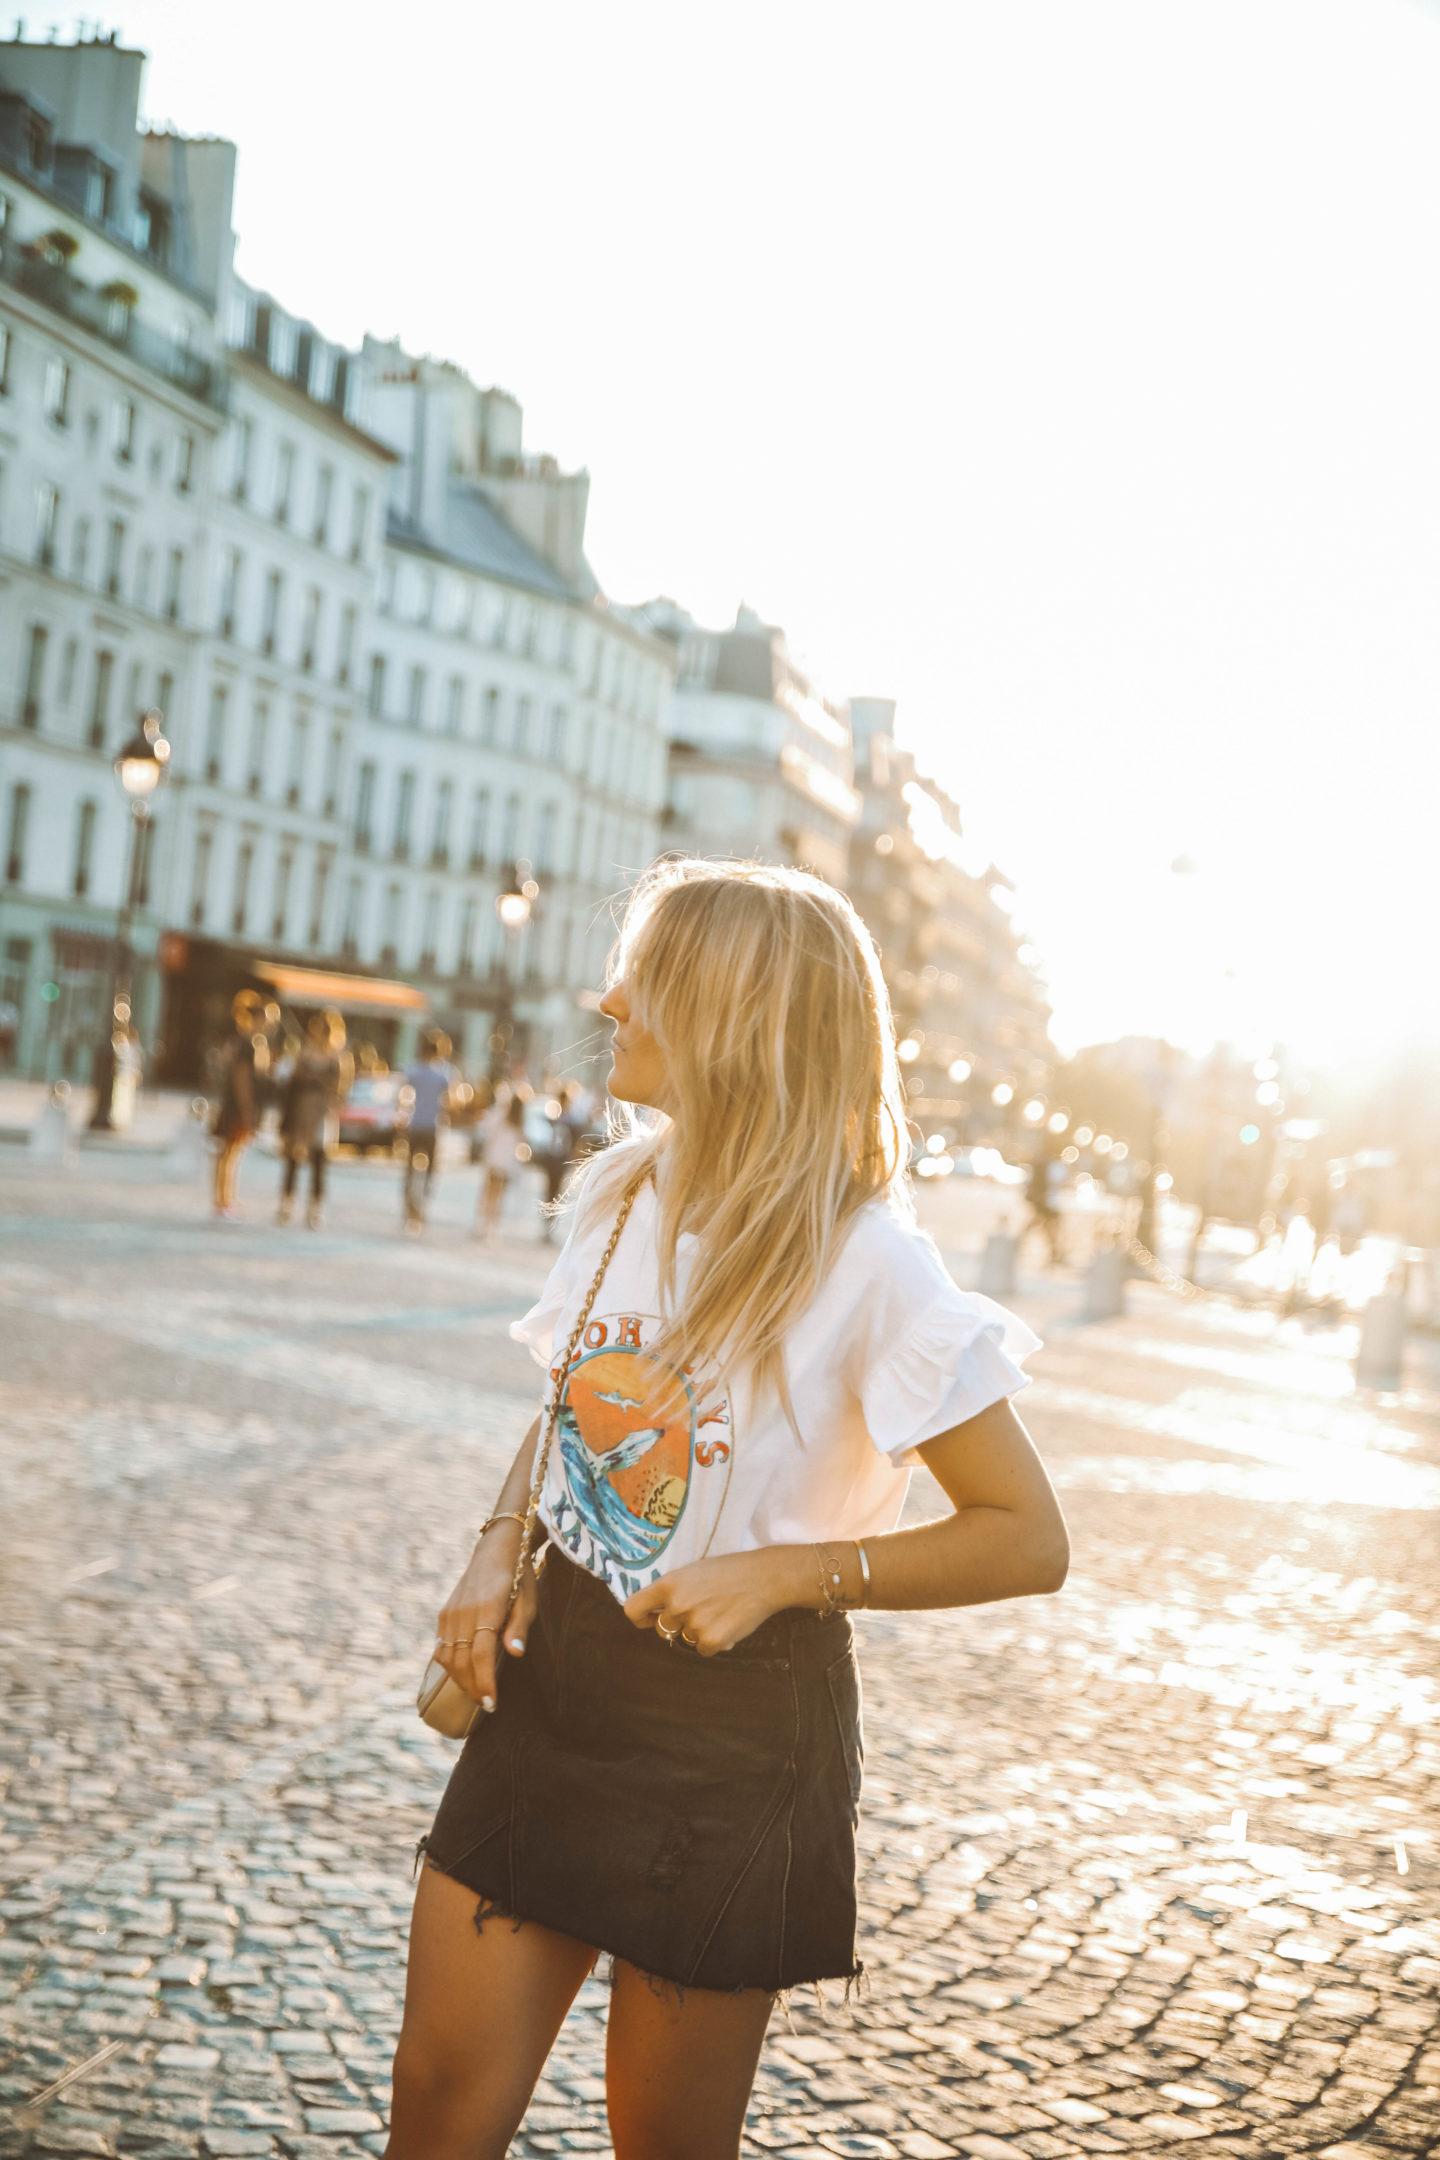 Jupe GRLFRND Denim - Blondie Baby blog mode Paris et voyages